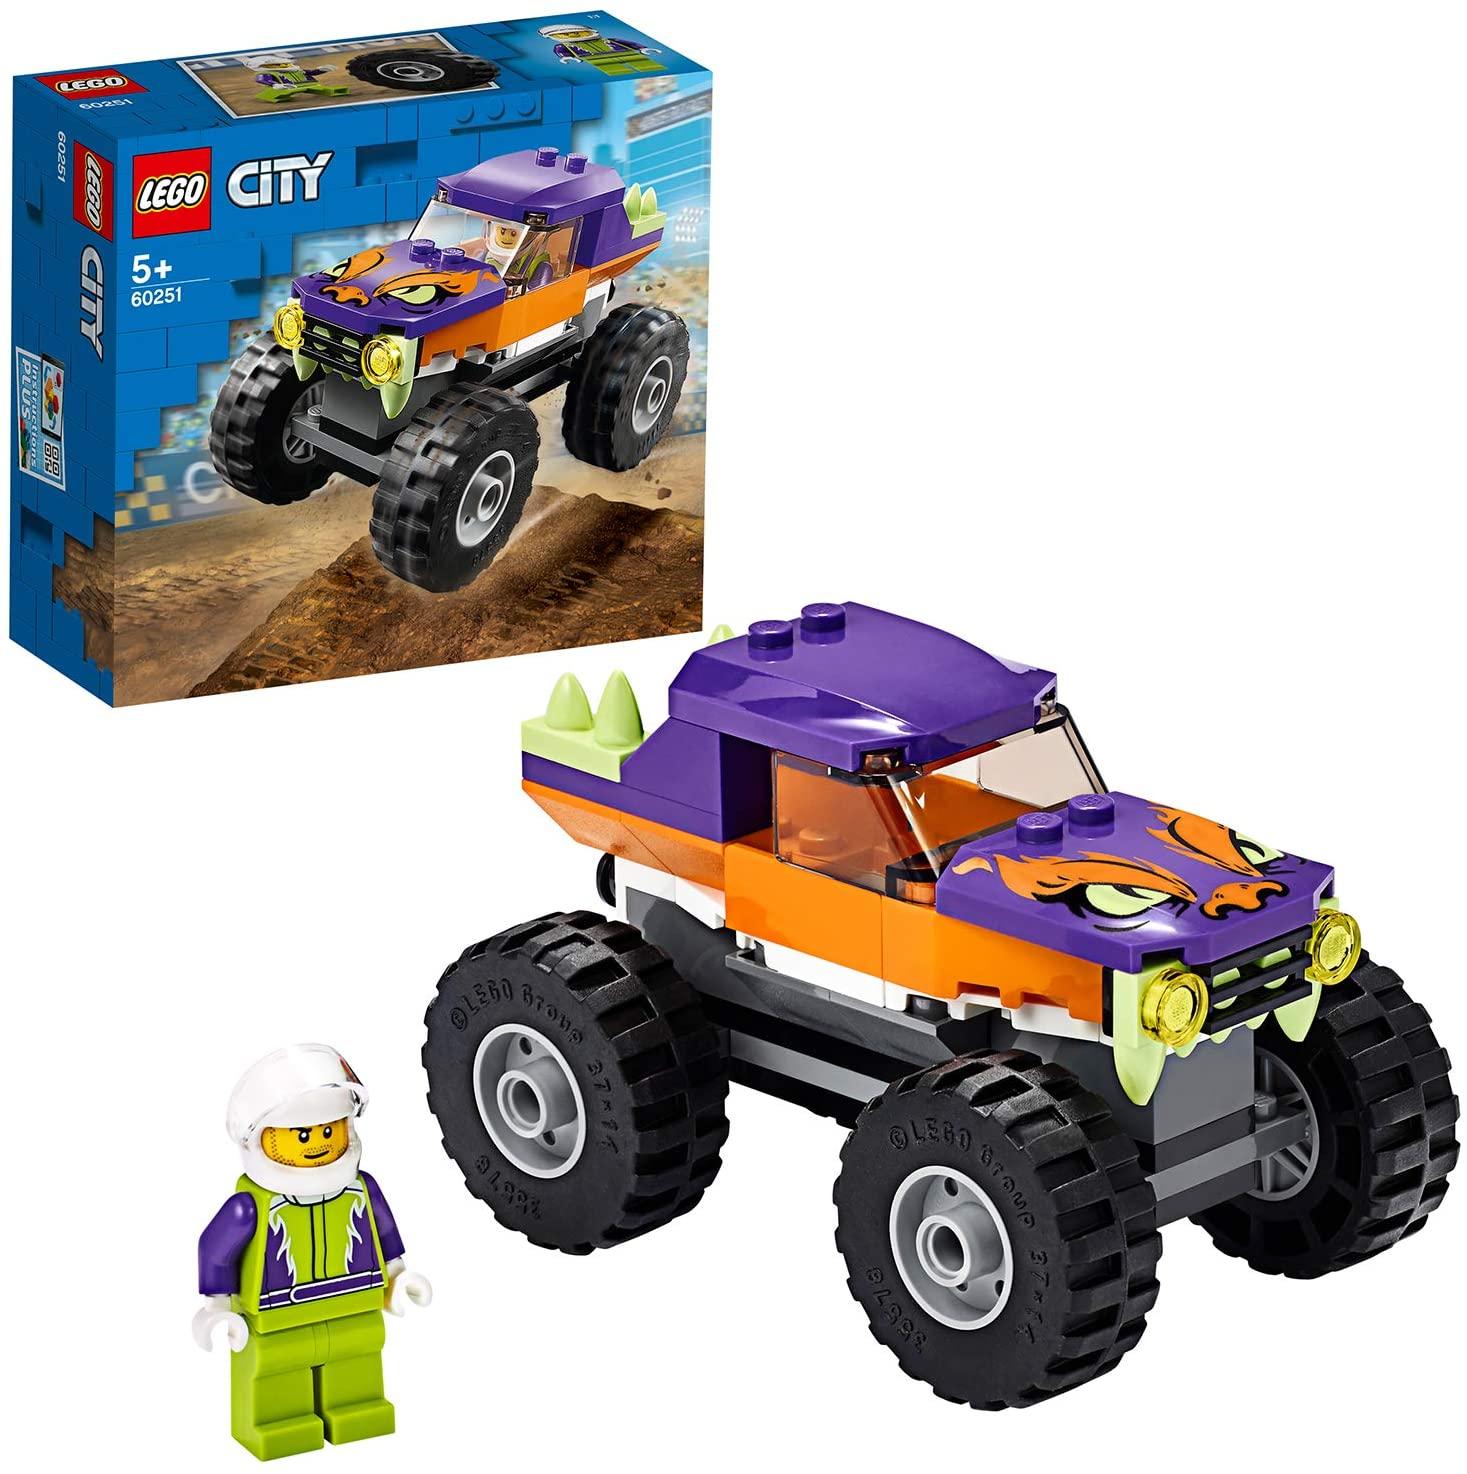 LEGO City - Monster-Truck (60251) für 7,70€ (Amazon Prime & Thalia Club)